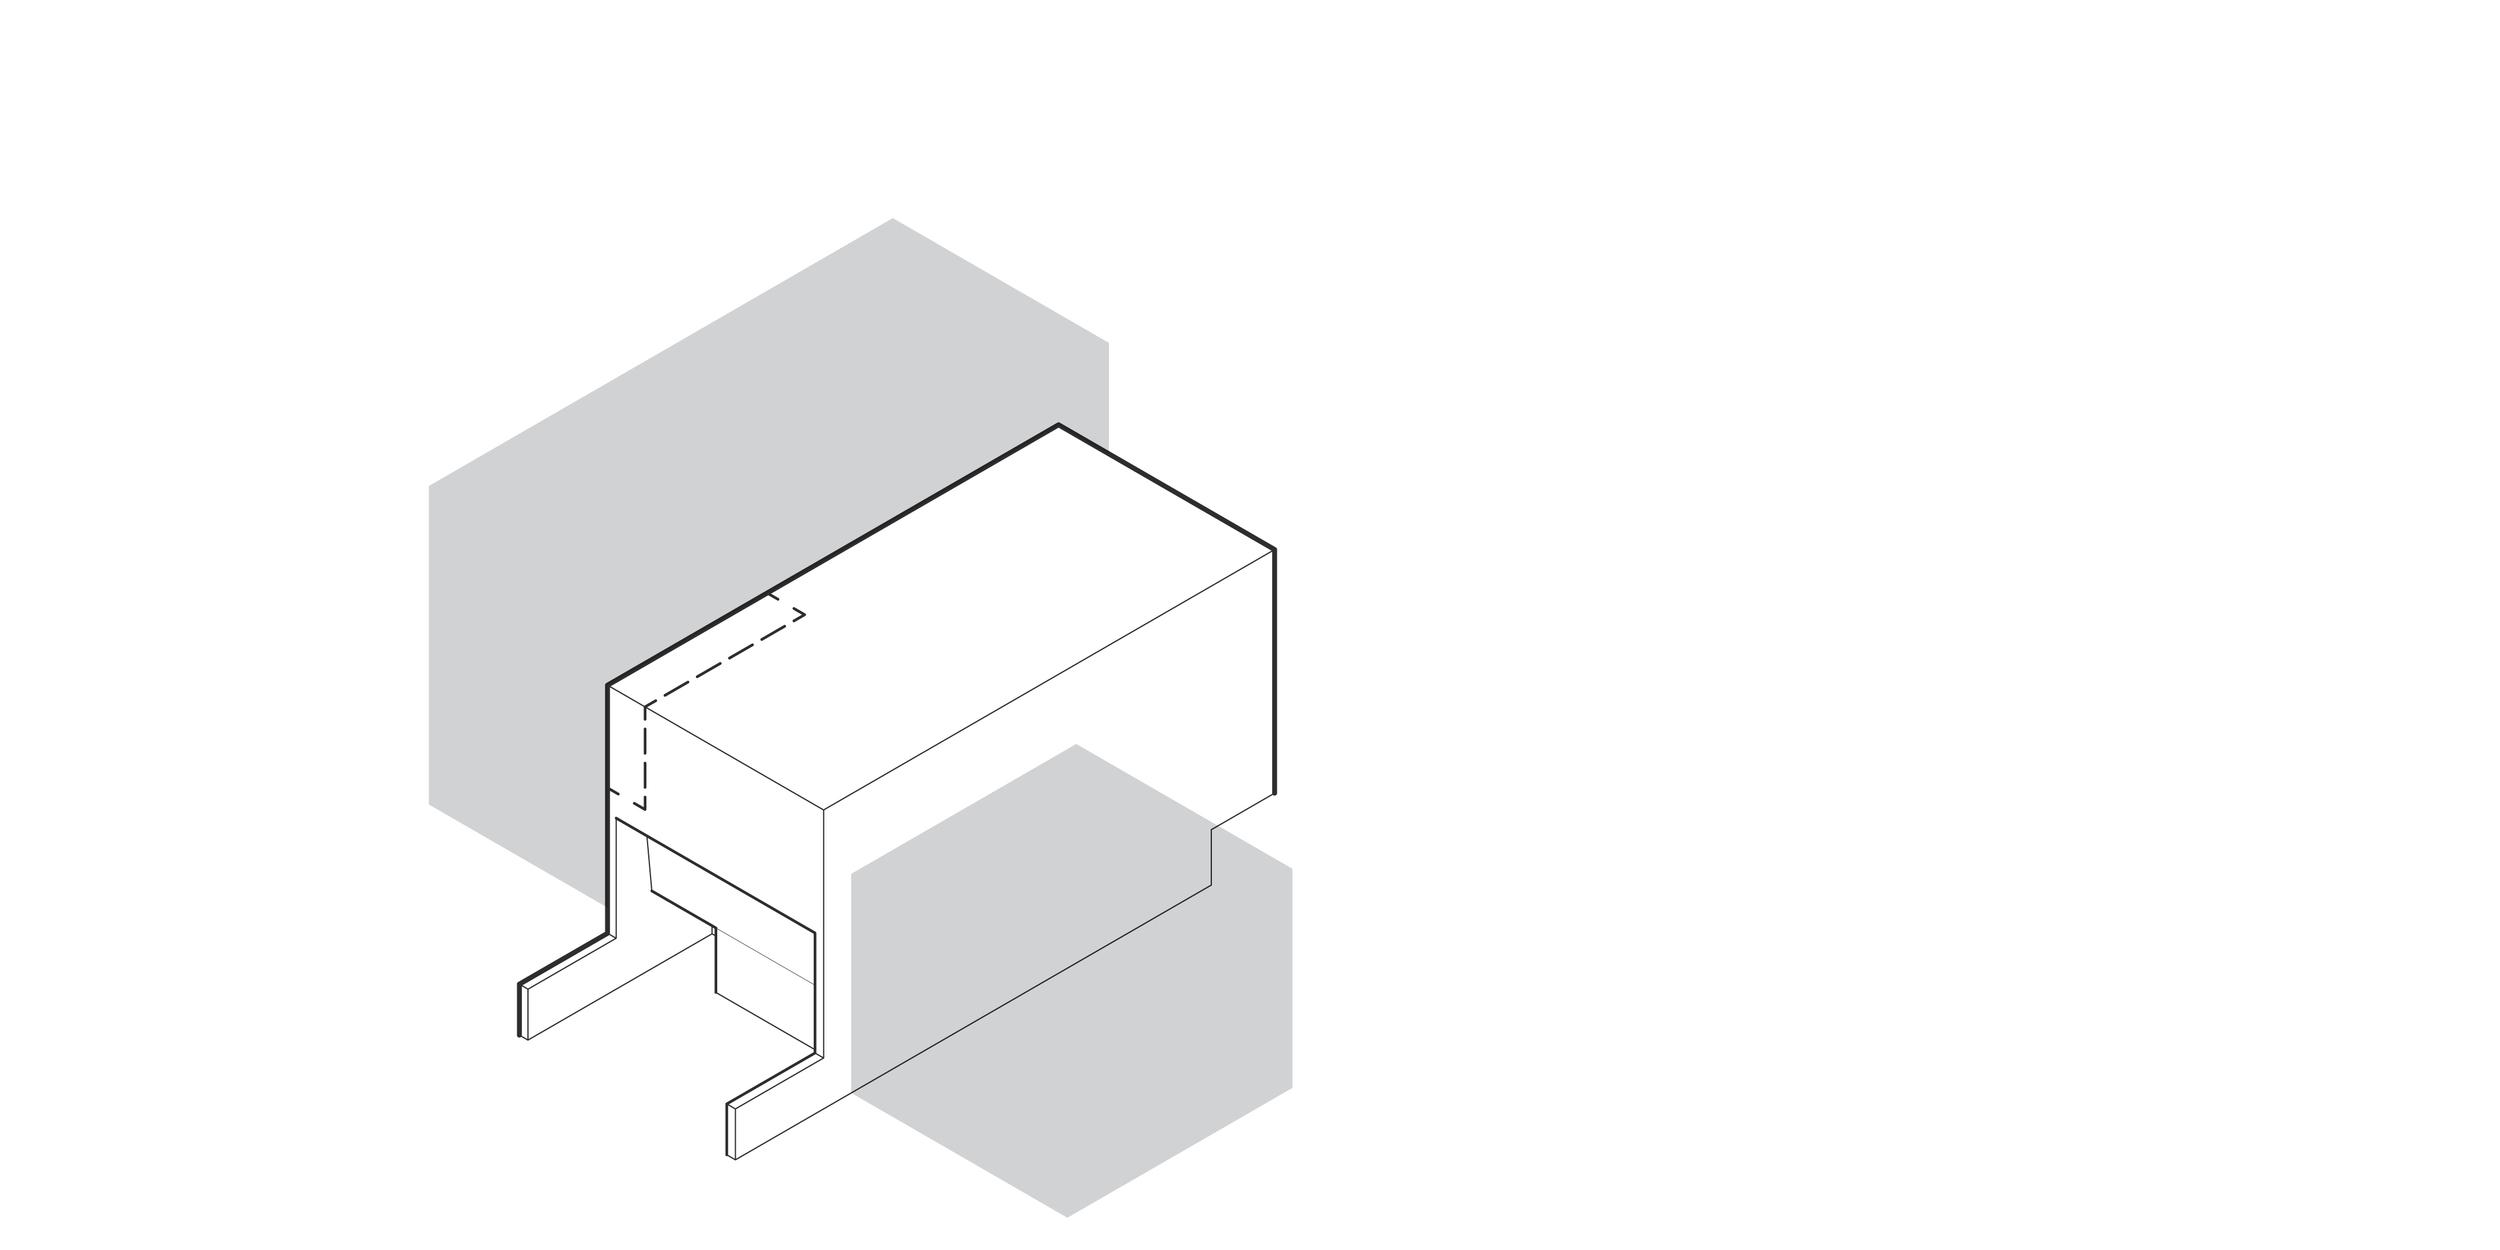 57_Highland-160413-Diagram-06-01.jpg